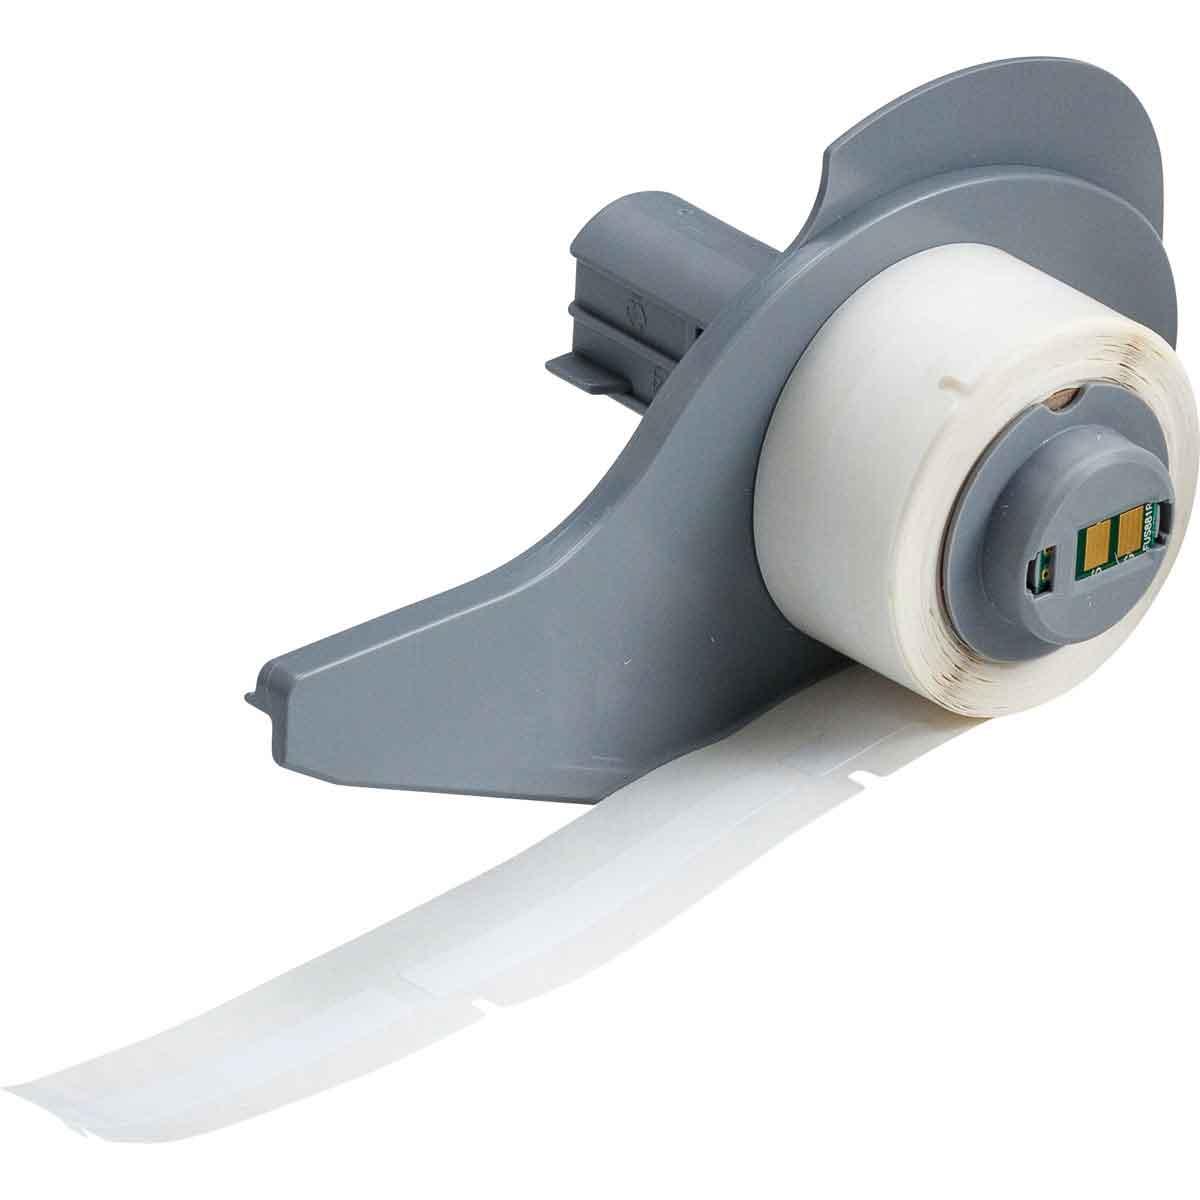 Gloss Finish White BradyBondz Label 100 per Roll Brady PTL-20-483 TLS 2200 and TLS PC Link 2 Width x 1 Height B-483 Ultra Aggressive Polyester